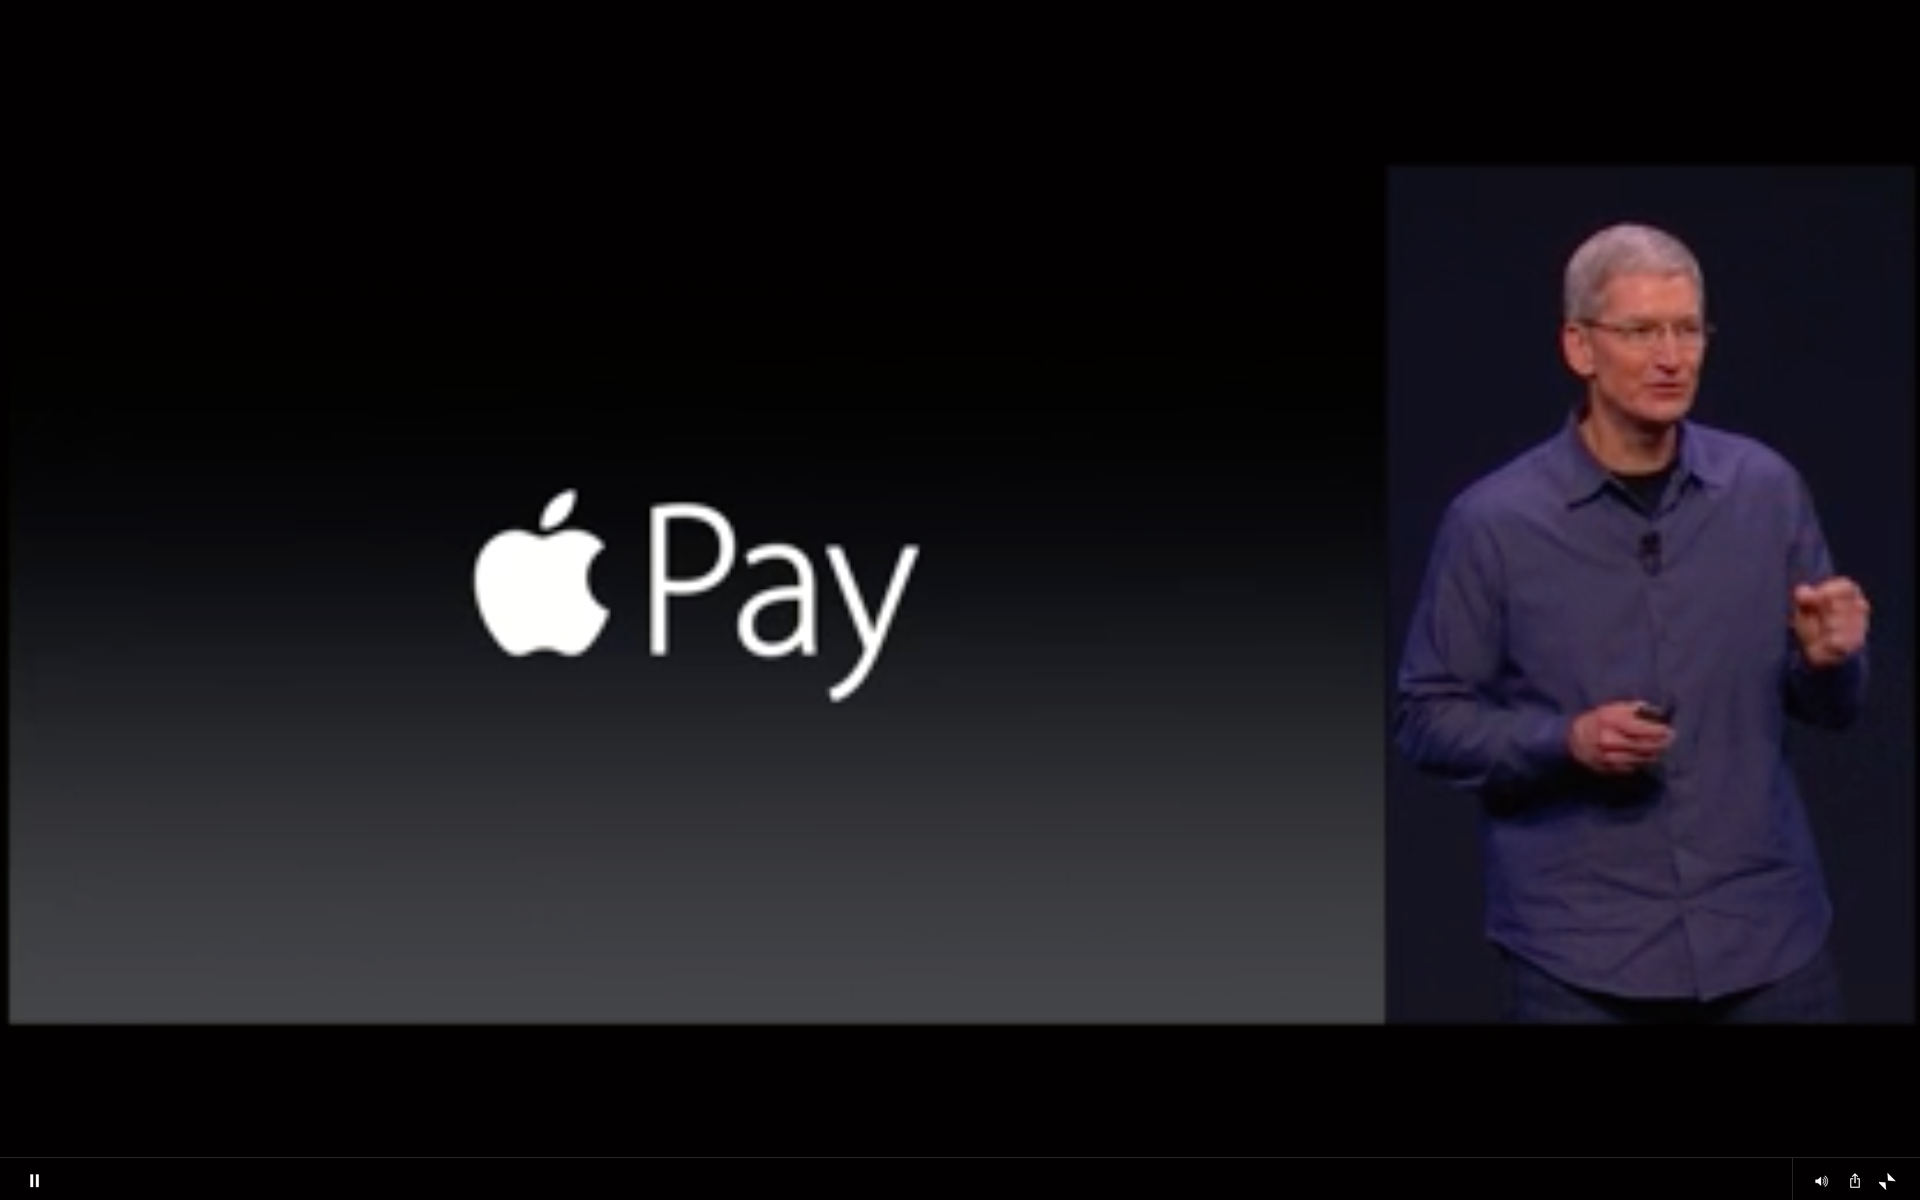 Apple Pay, selsakpets nye betalløsning.